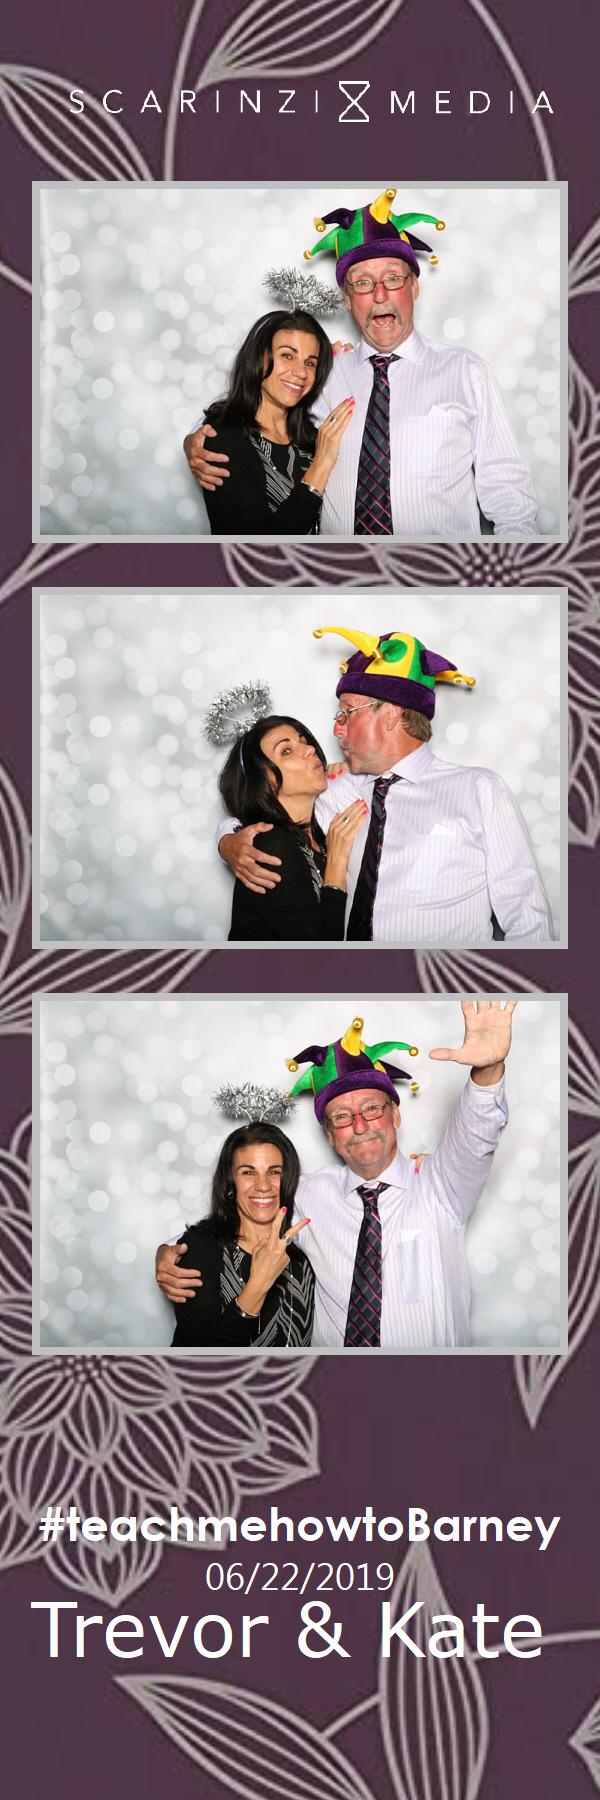 2019.06.22 - Barney Wedding PHOTOBOOTH42.jpg